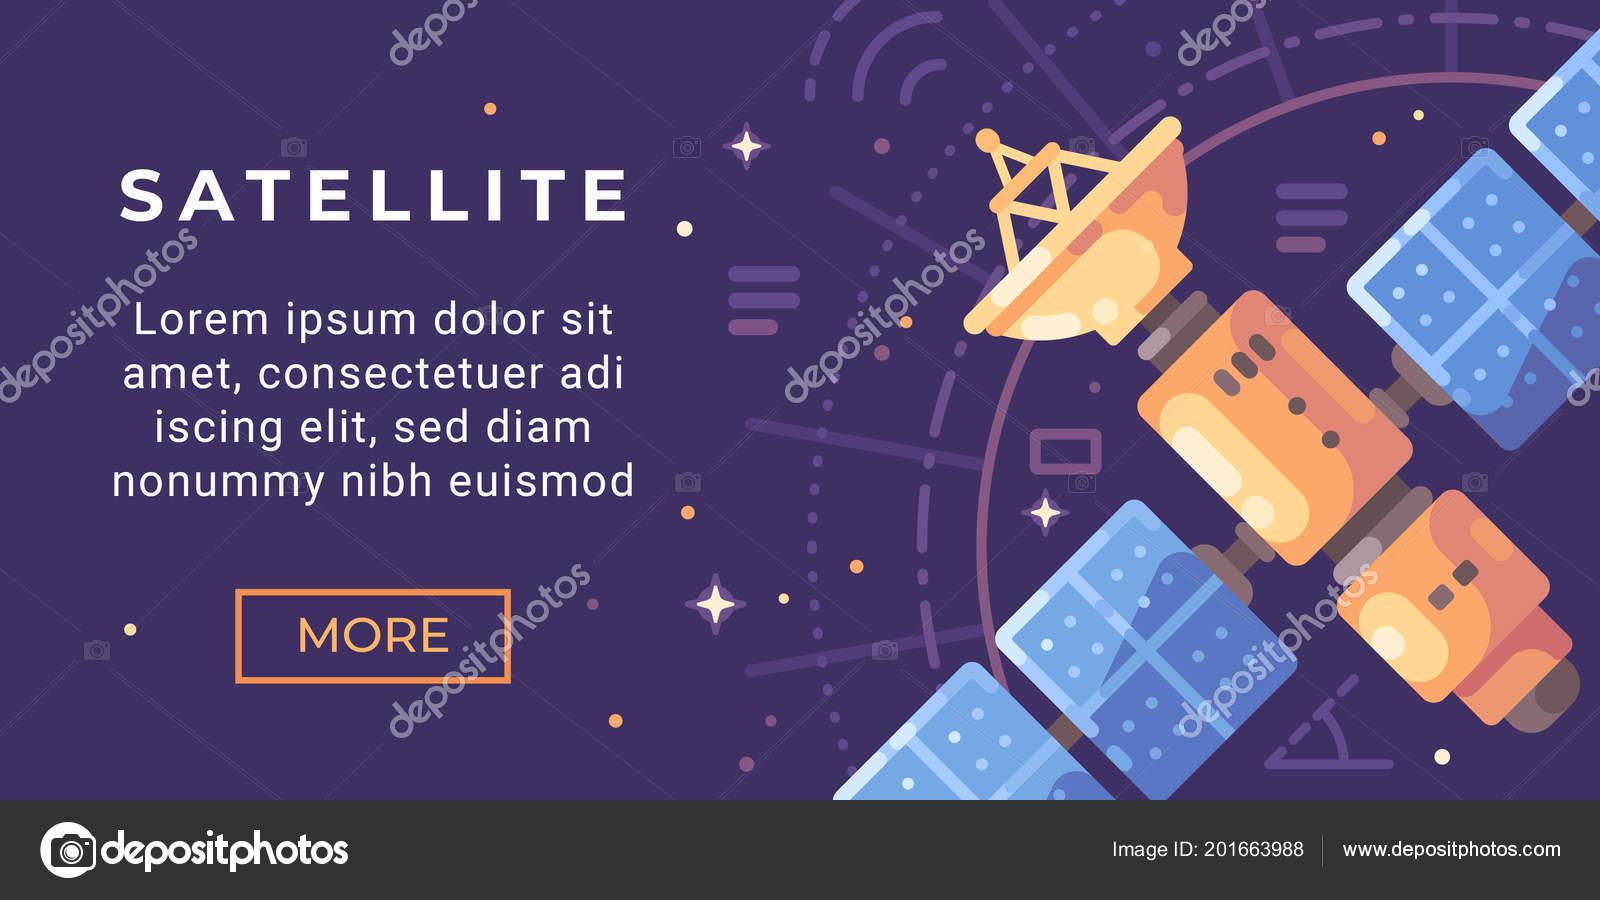 Space Exploration Banner Flat Illustration Astronomy Banner Satellite Space Stock Vector C Ivandubovik 201663988